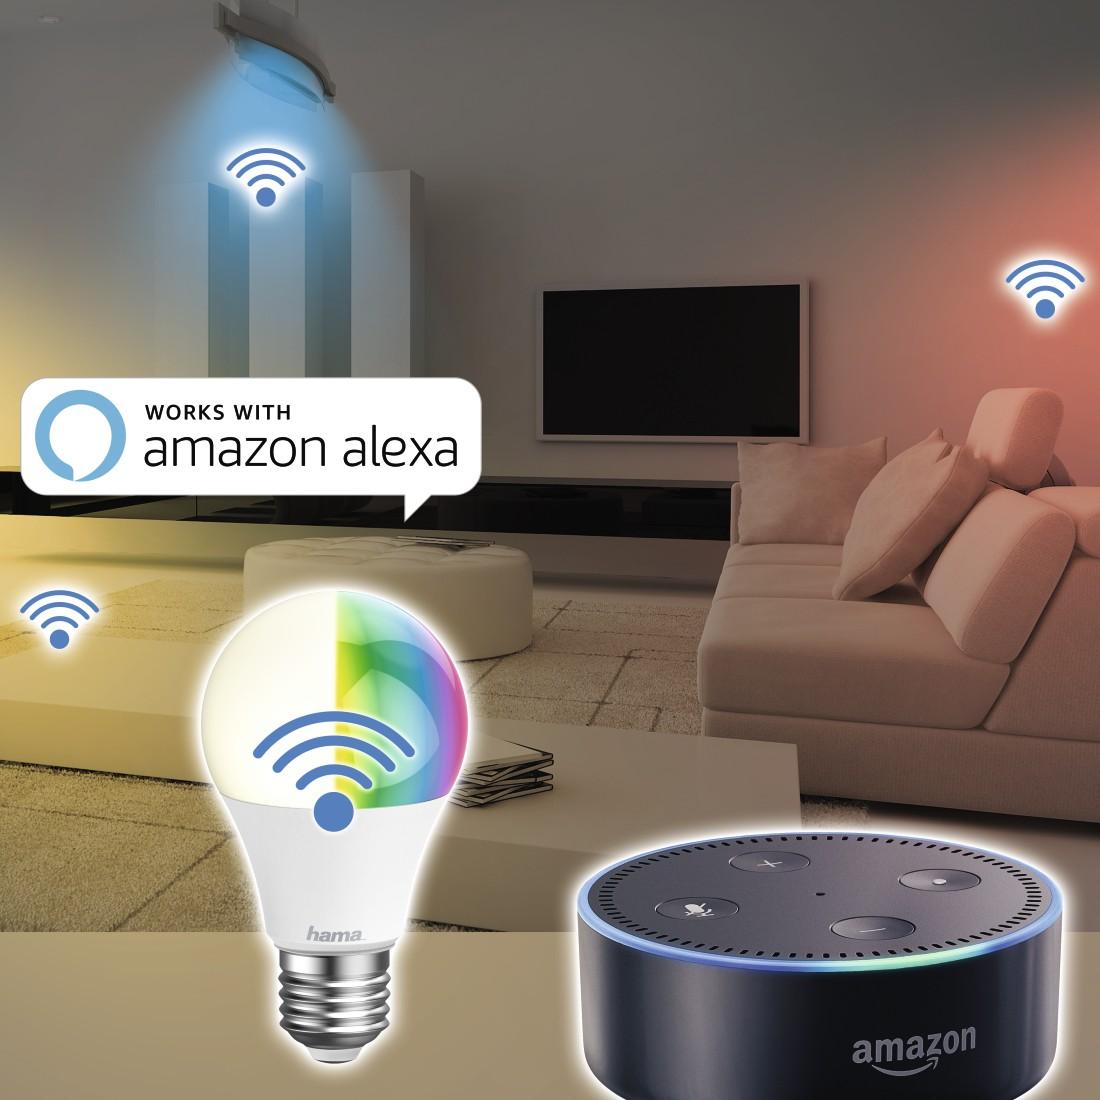 20 Hama WiFi-LED Light, E20, 20W, RGB, can be dimmed  Hama DE